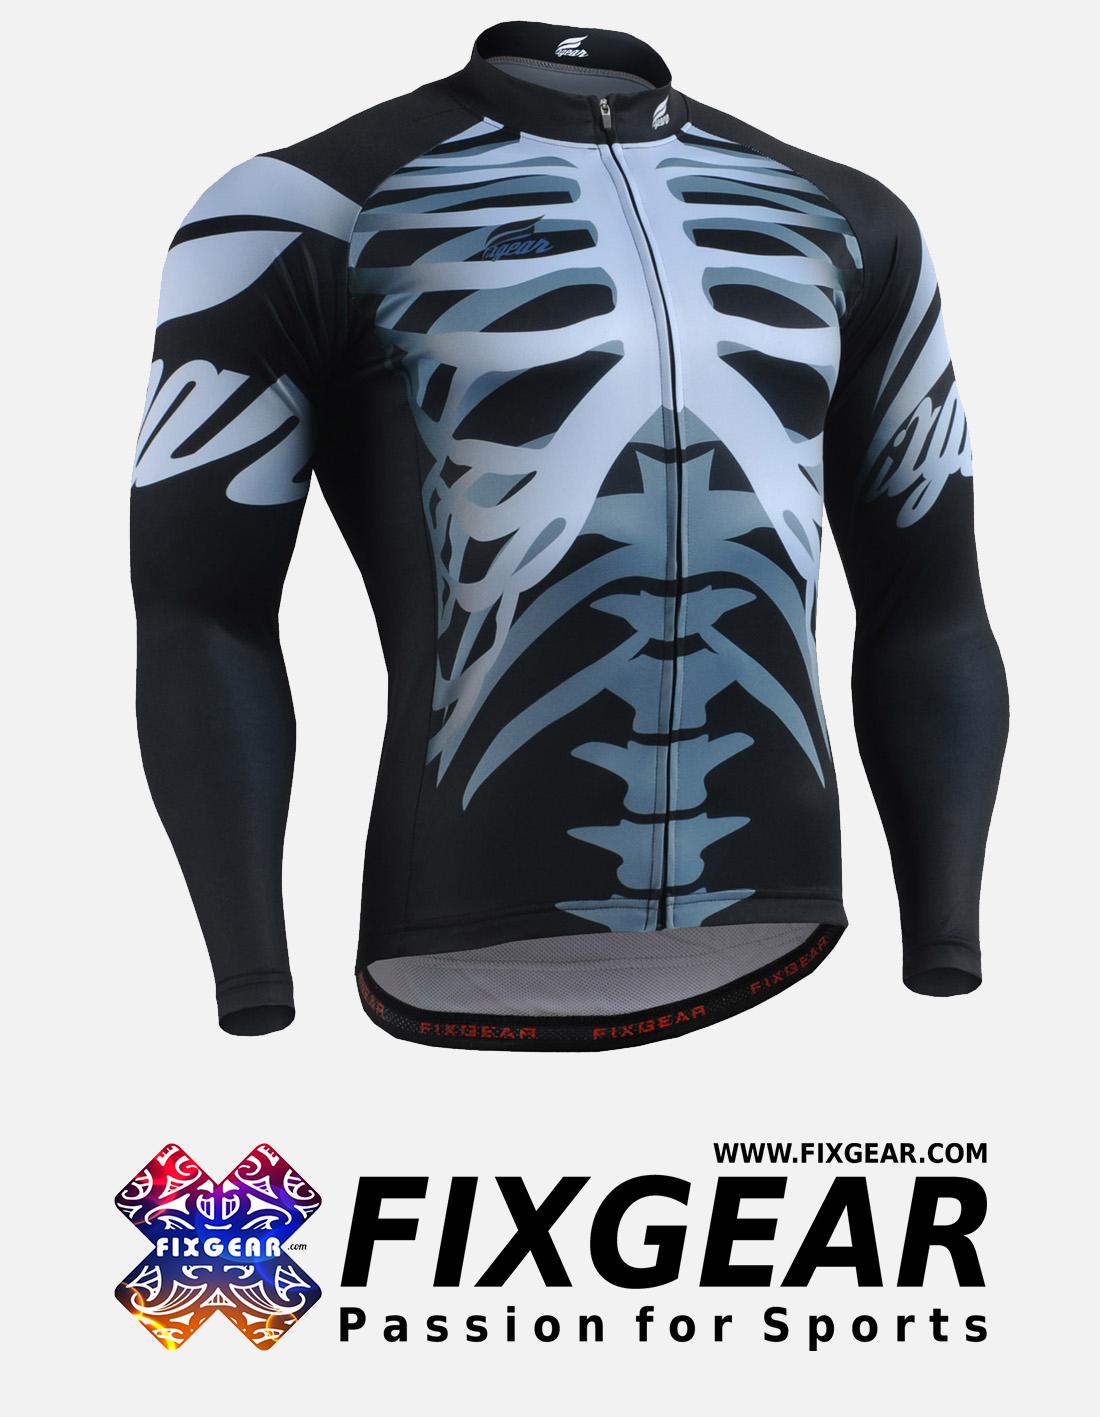 FIXGEAR CS-5501 Men's Cycling Jersey Long Sleeve